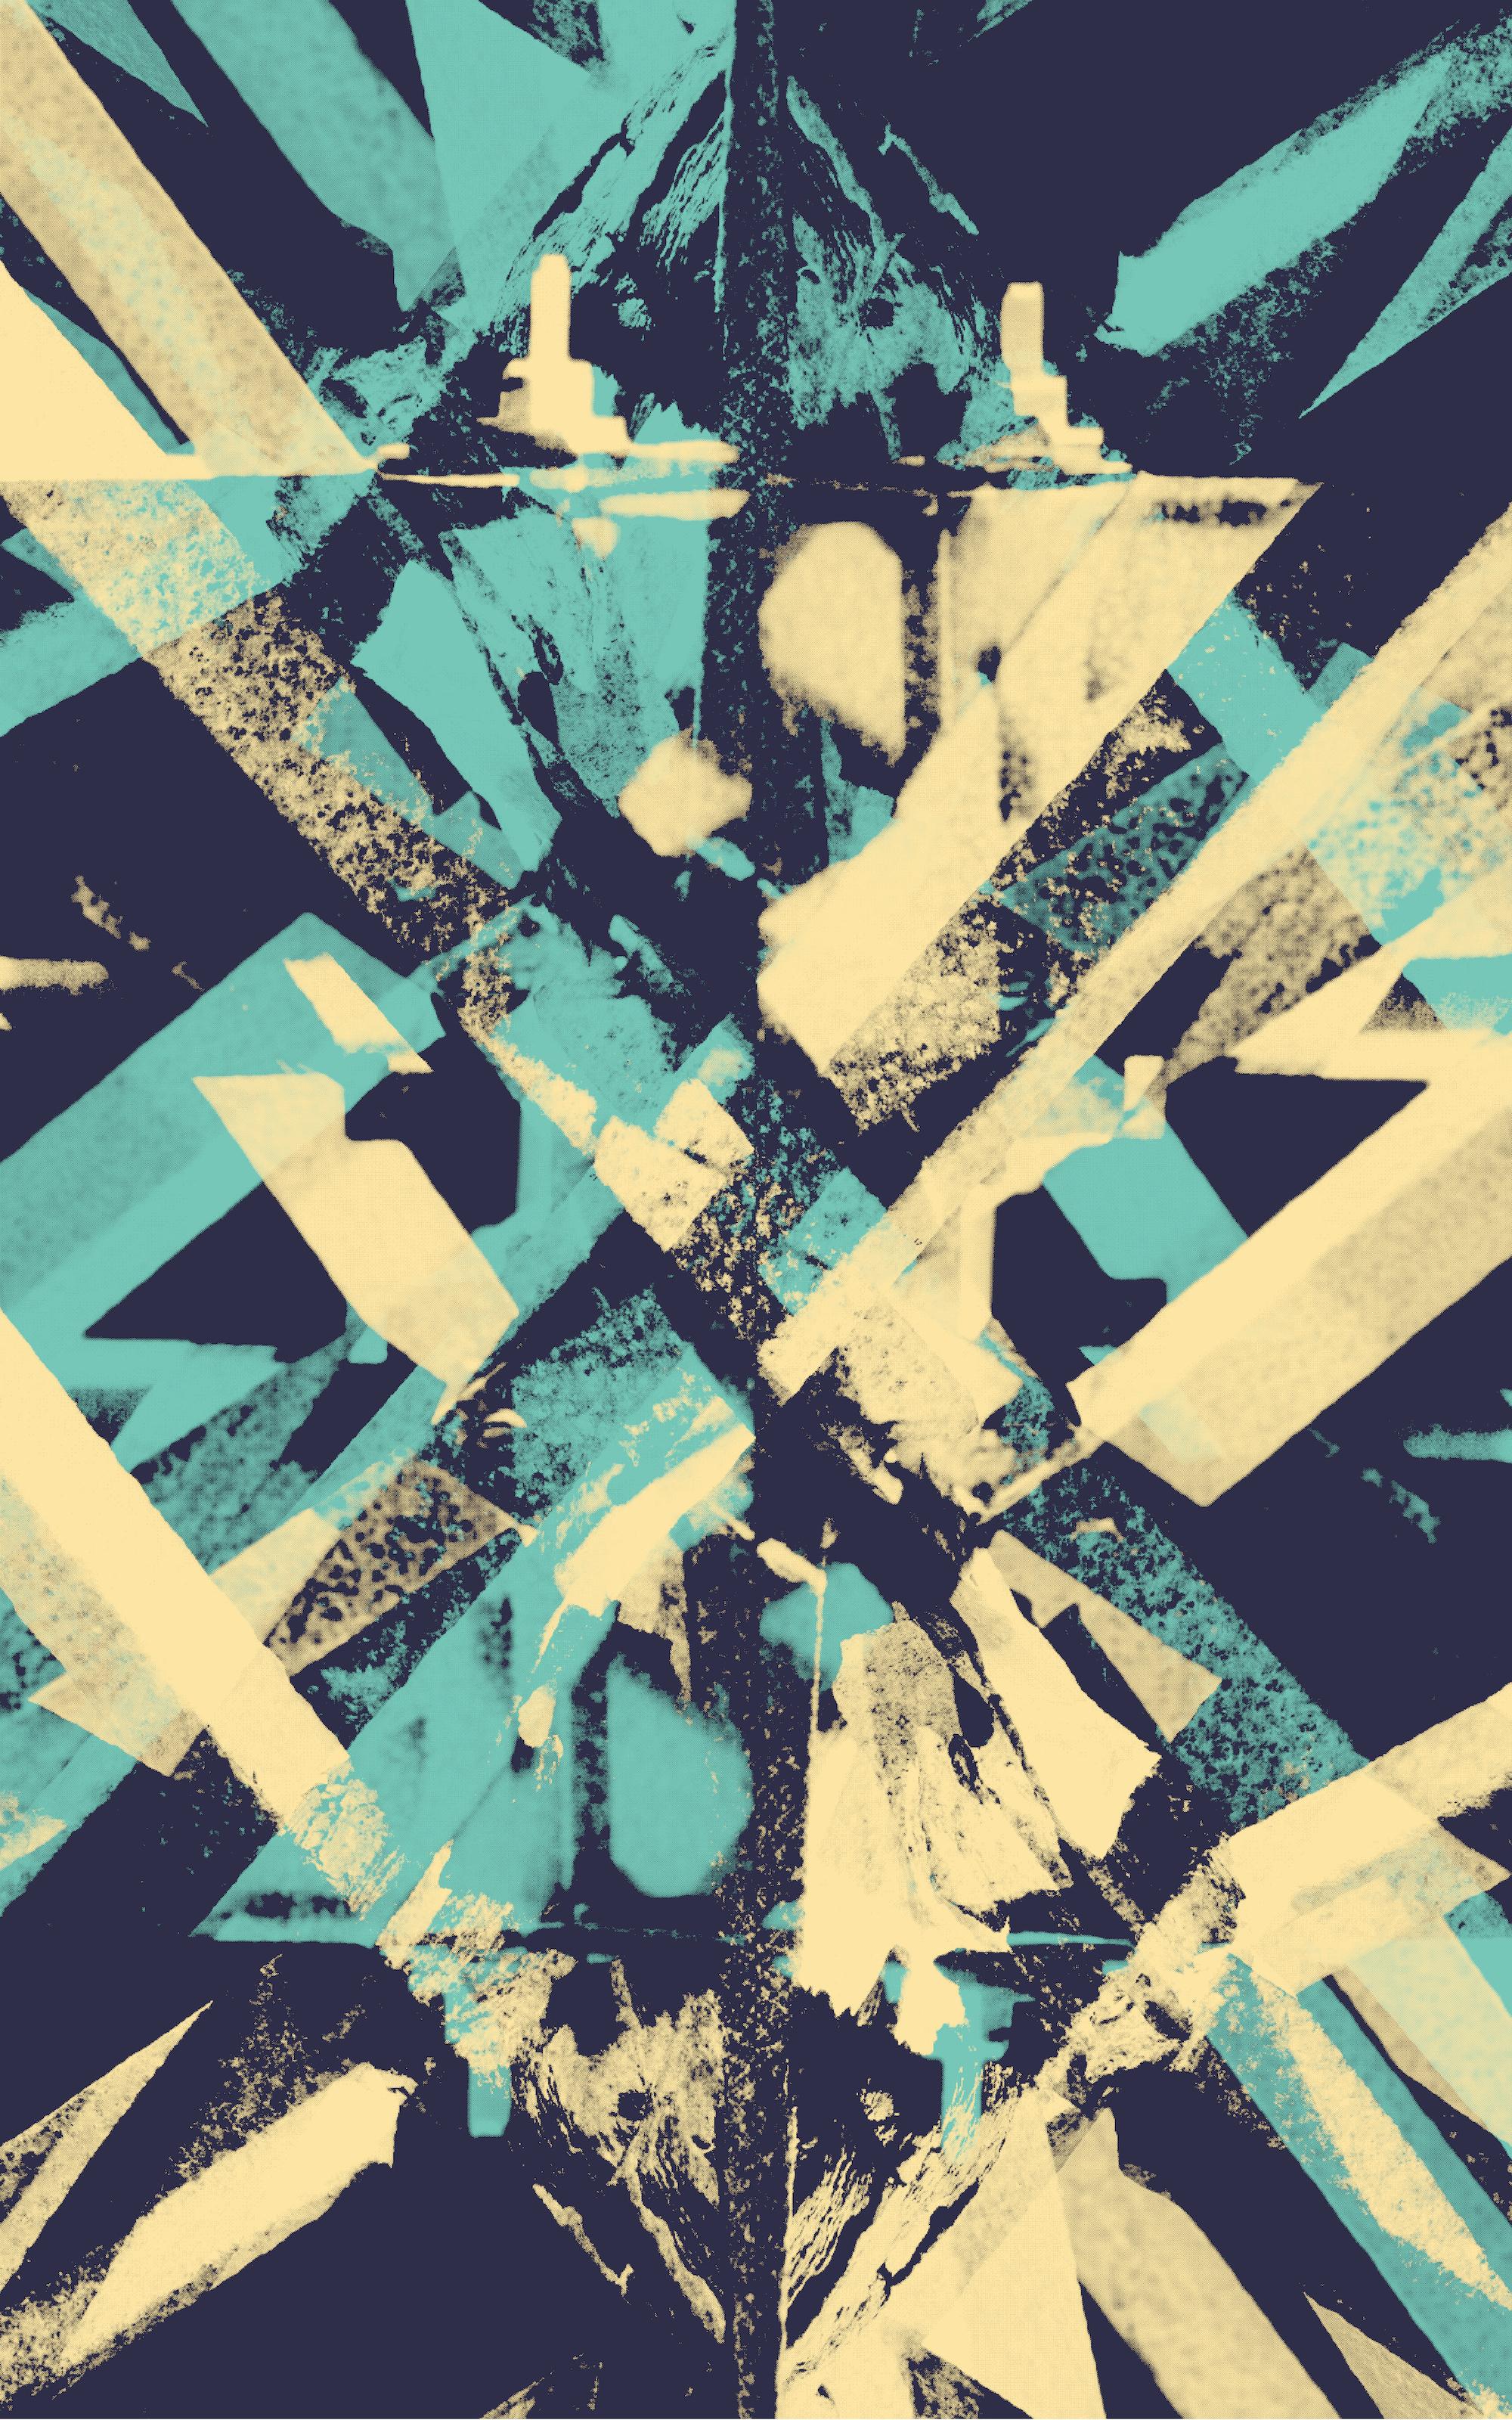 15_NP17_Cubism.jpg